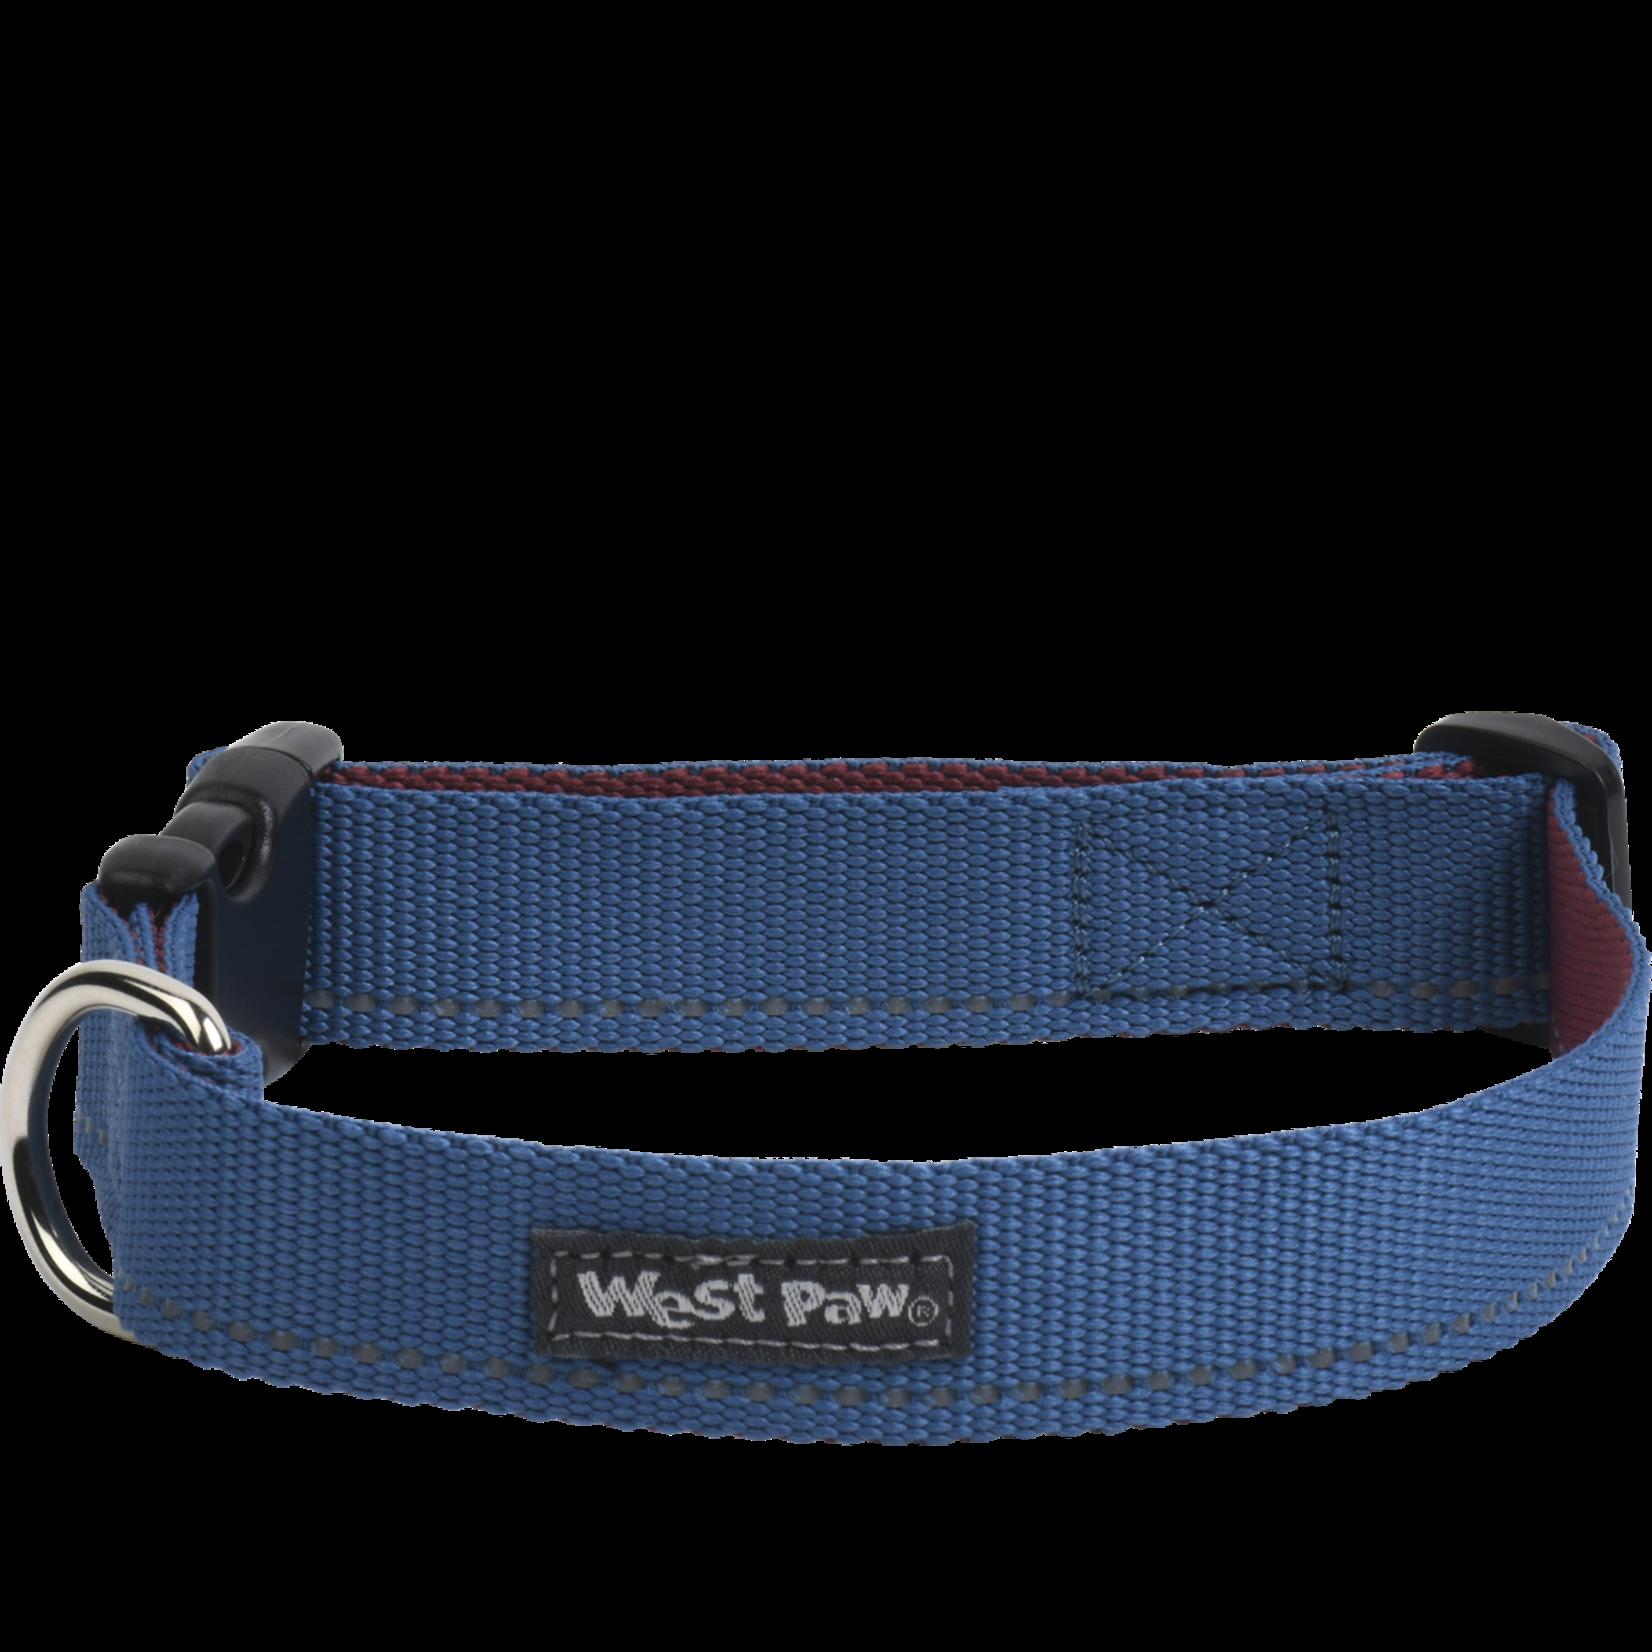 West Paw Strolls Collar Large, Fall